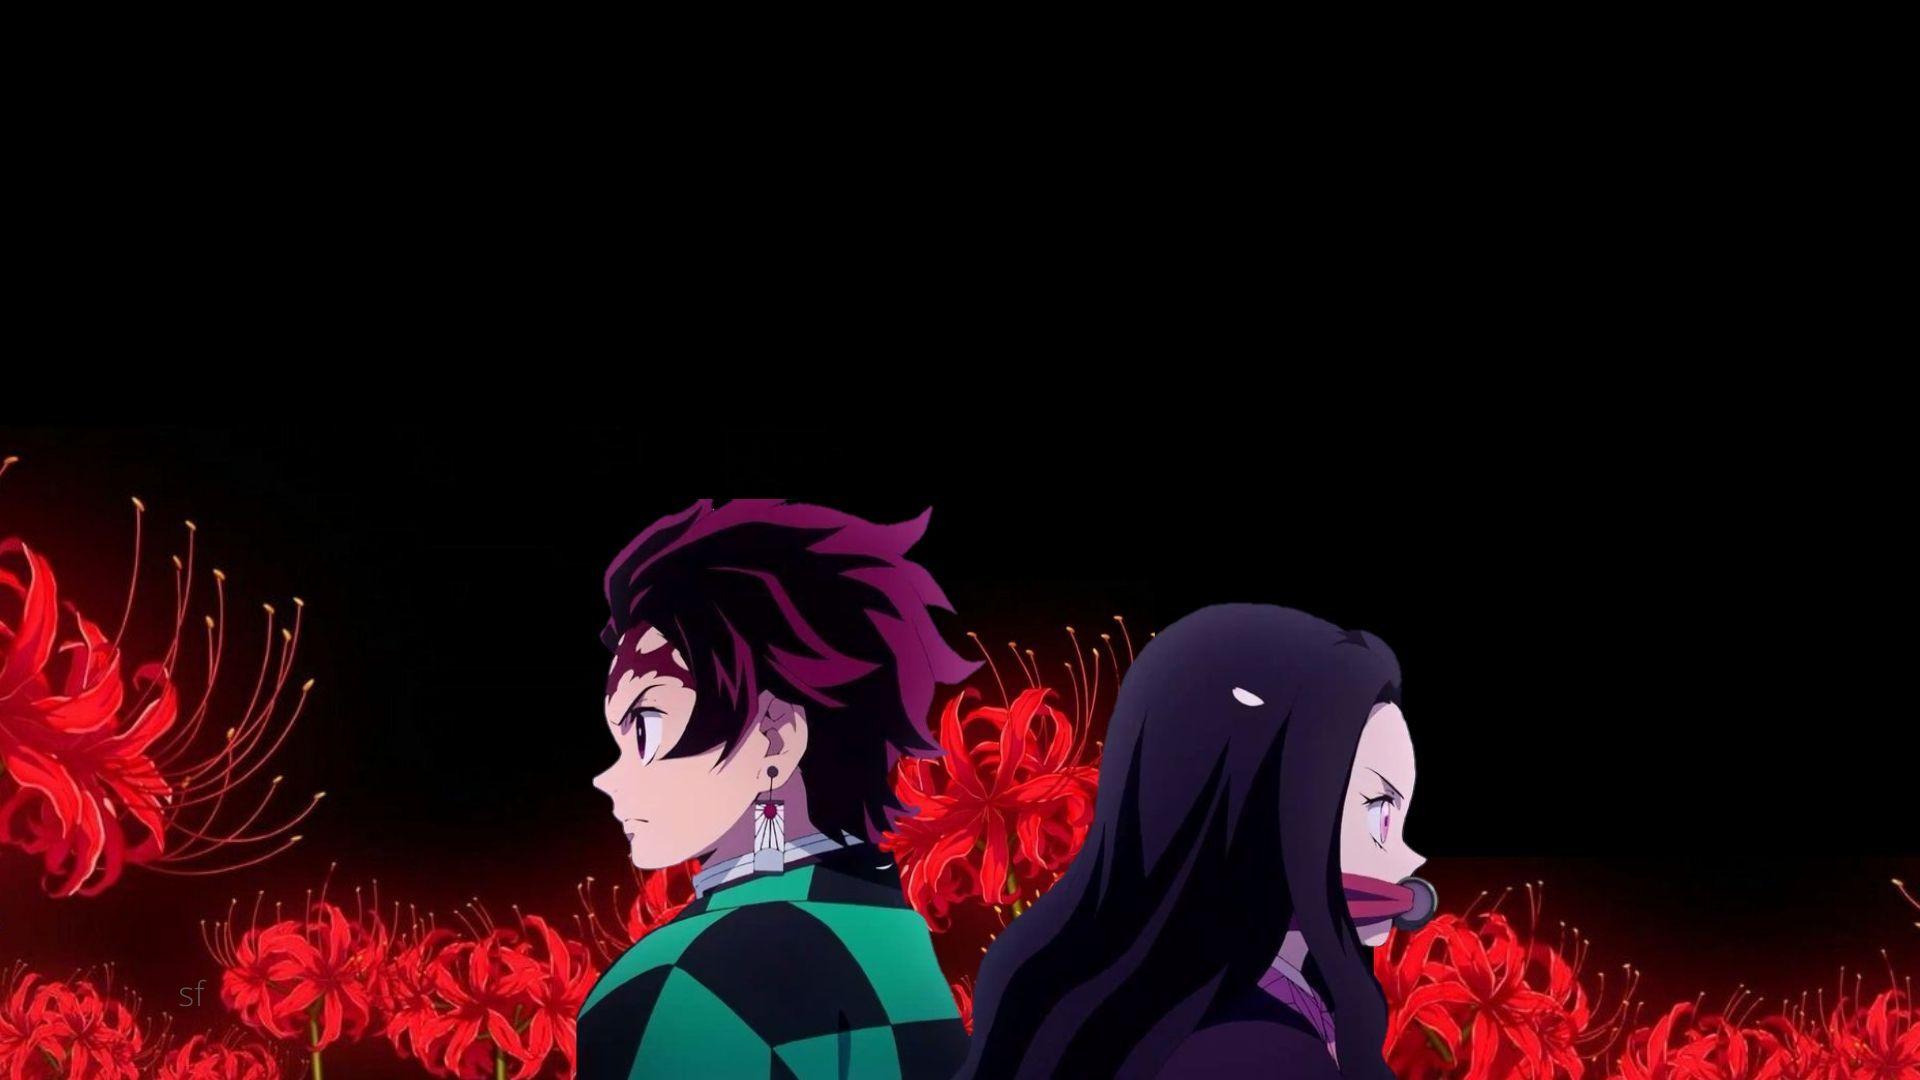 Kimetsu No Yaiba Desktop Wallpaper Anime Wallpaper Download Cute Laptop Wallpaper Cool Anime Wallpapers